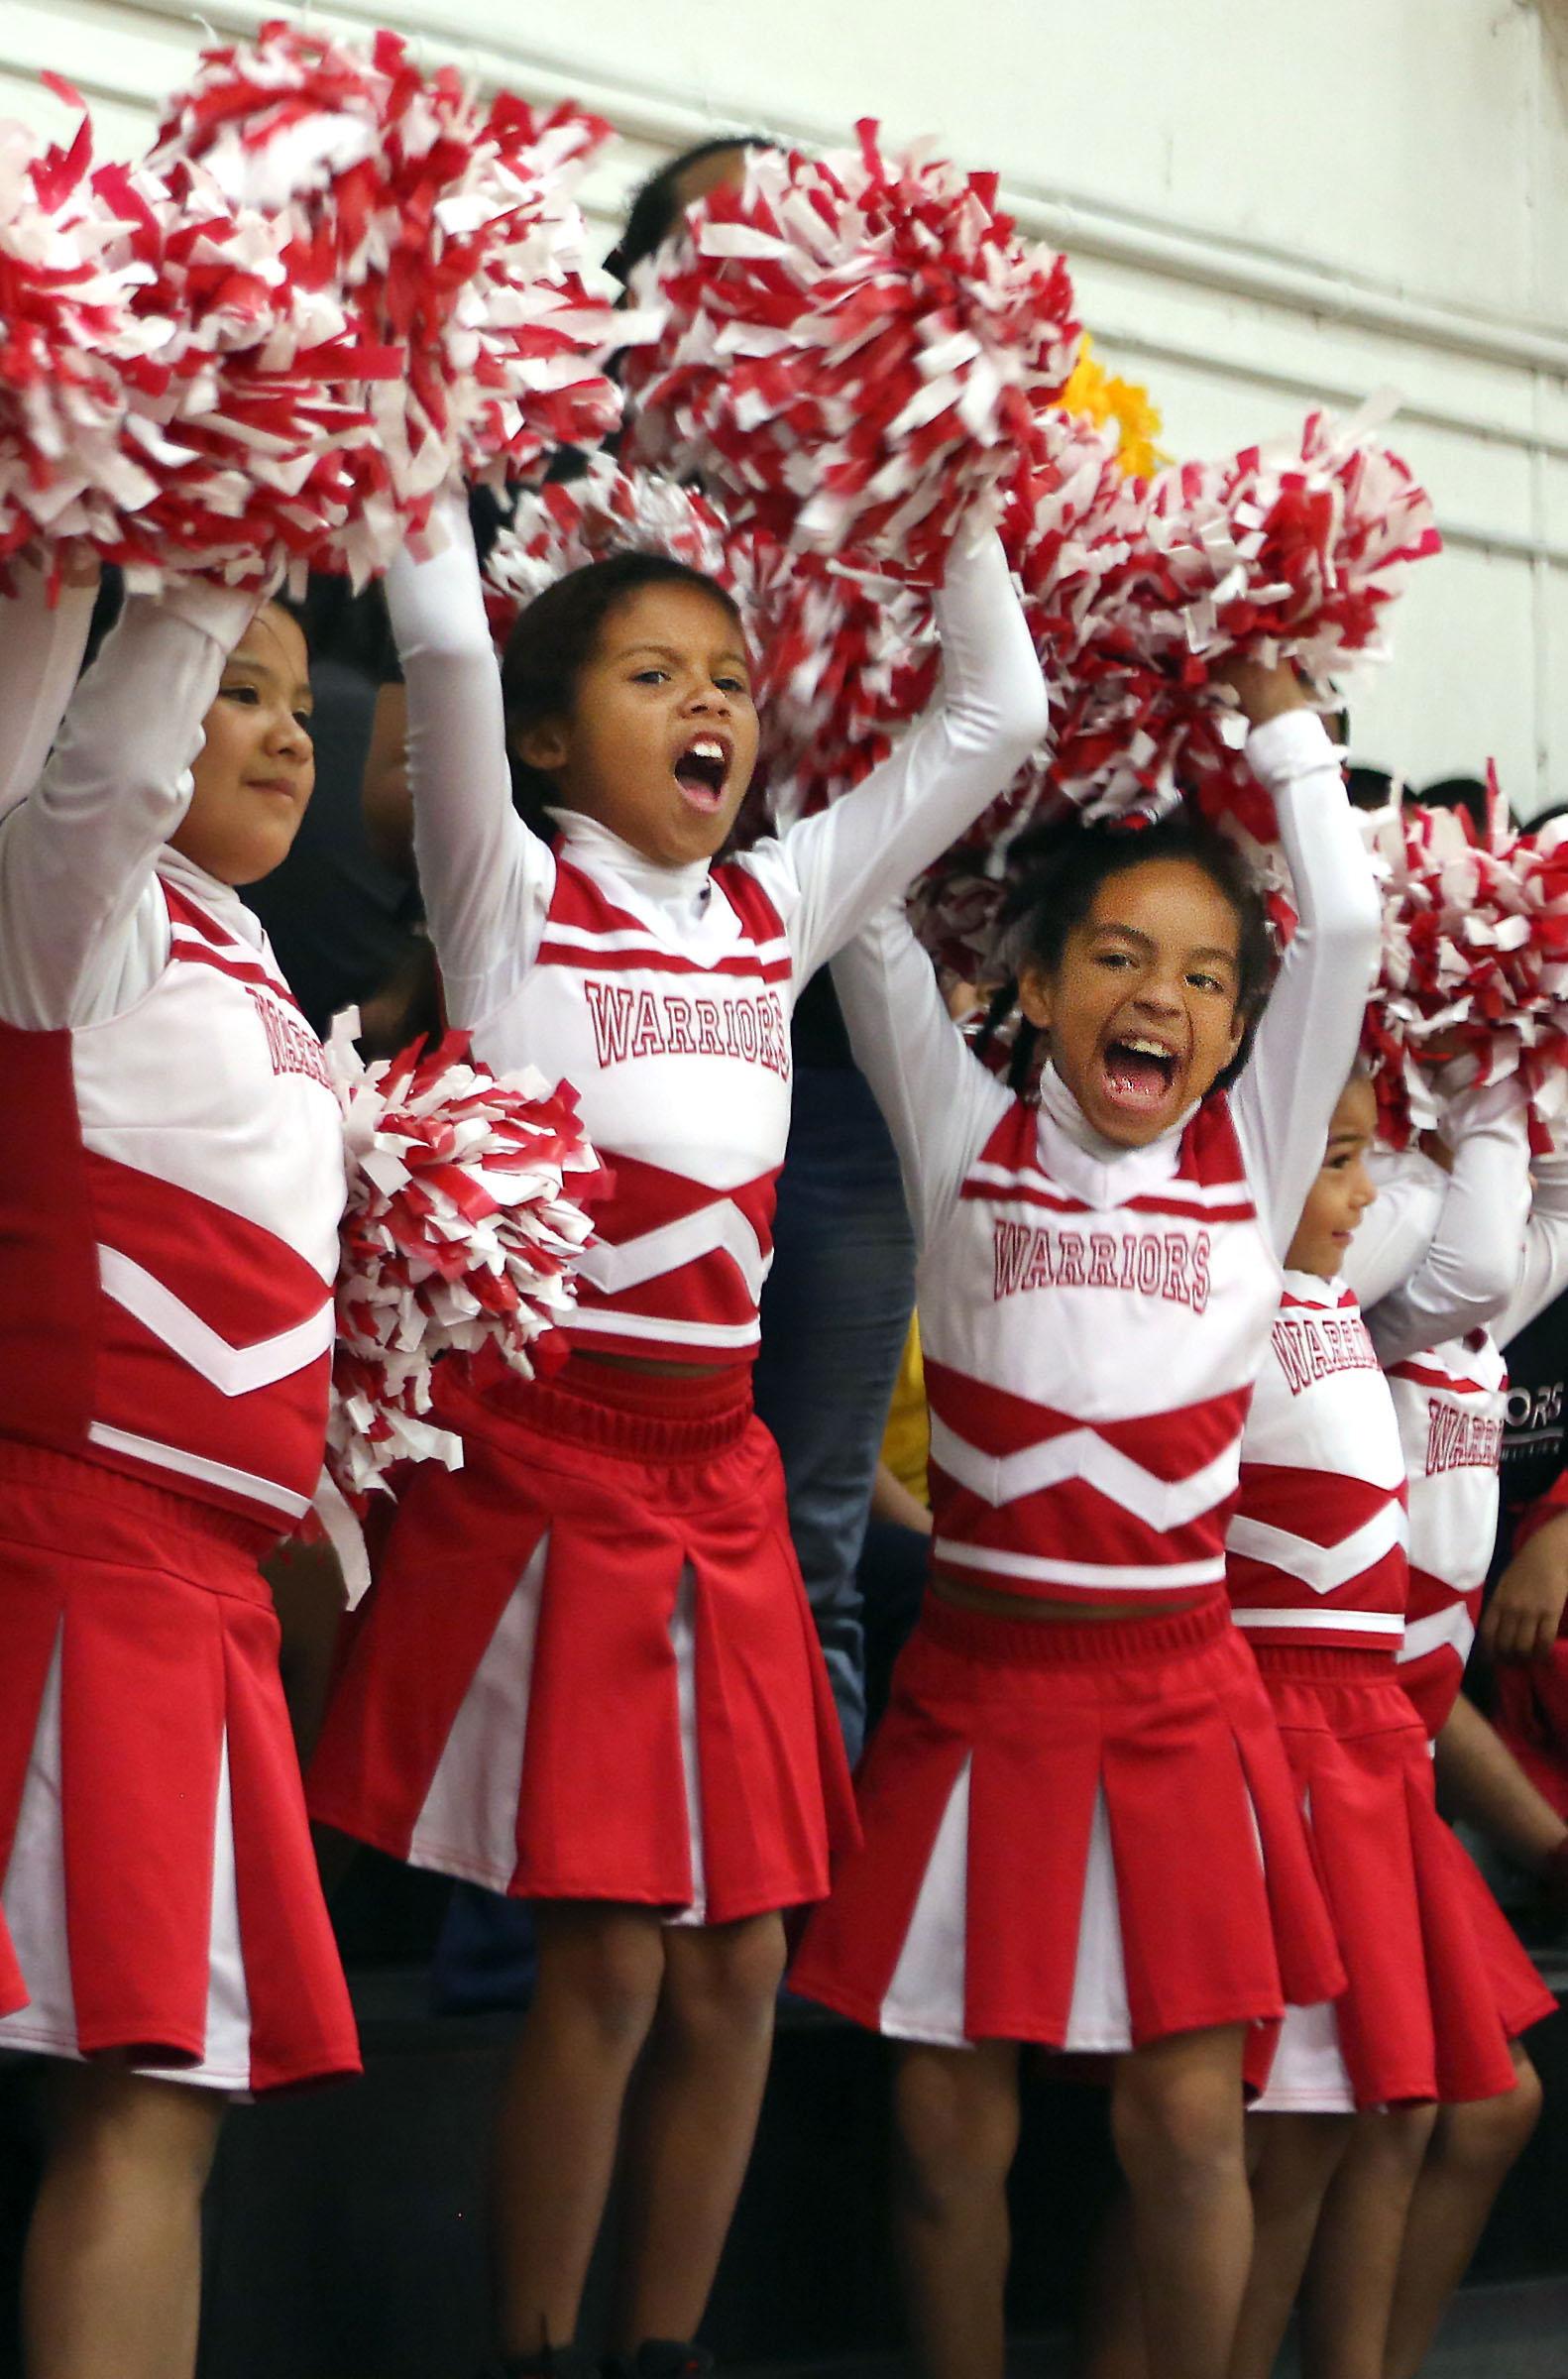 pep rally revs up ahfachkee school for testing  u2022 the seminole tribune